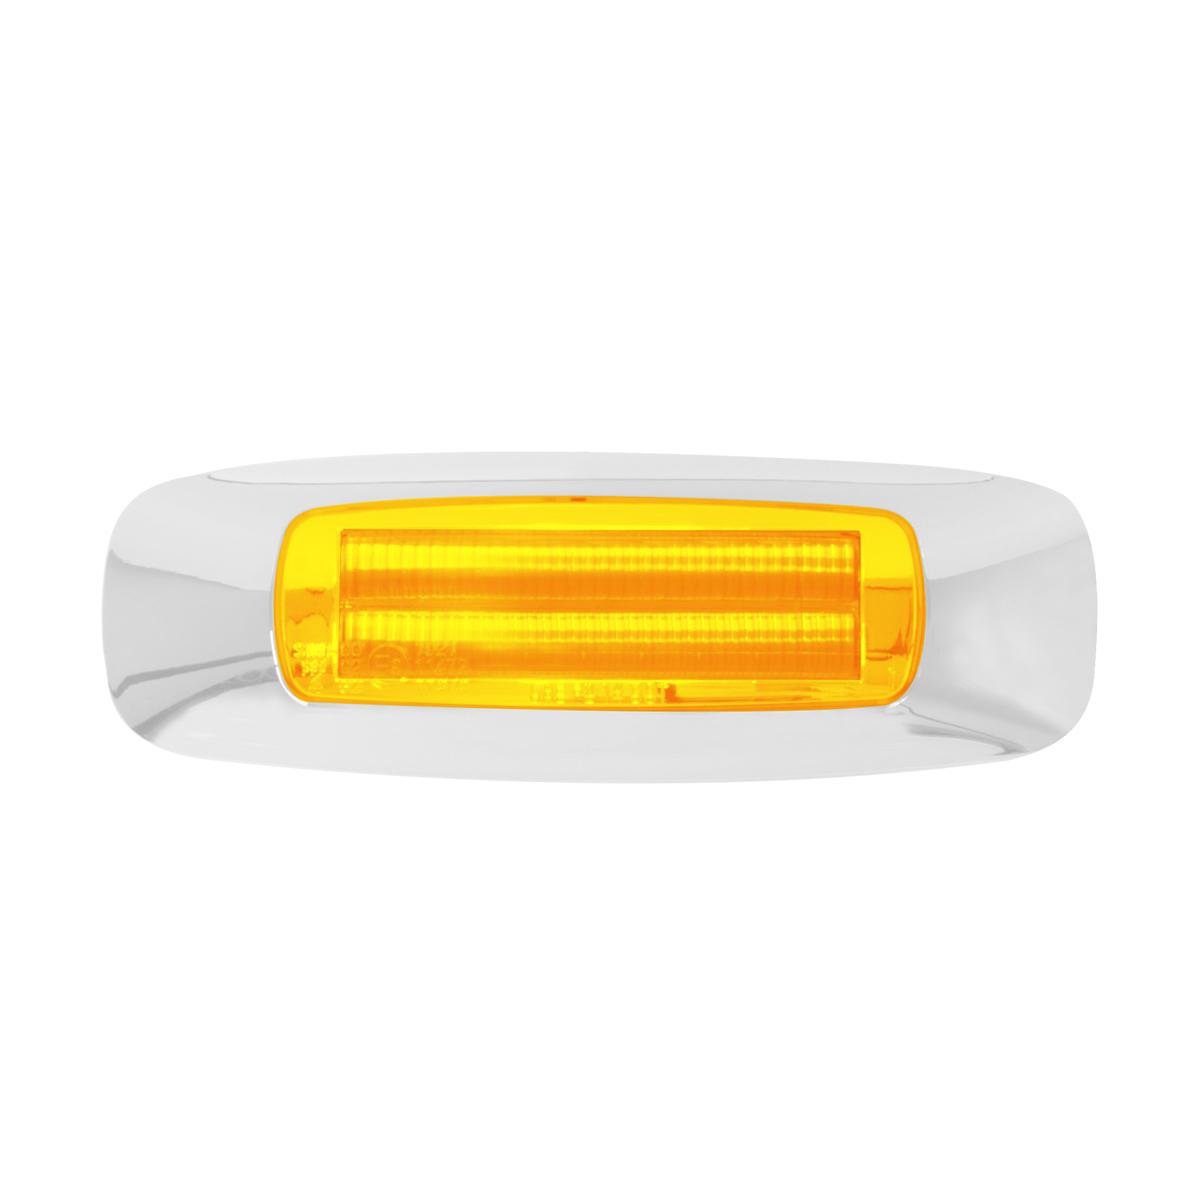 "74730 4-5/8"" Dual Function Rectangular Prime LED Light"